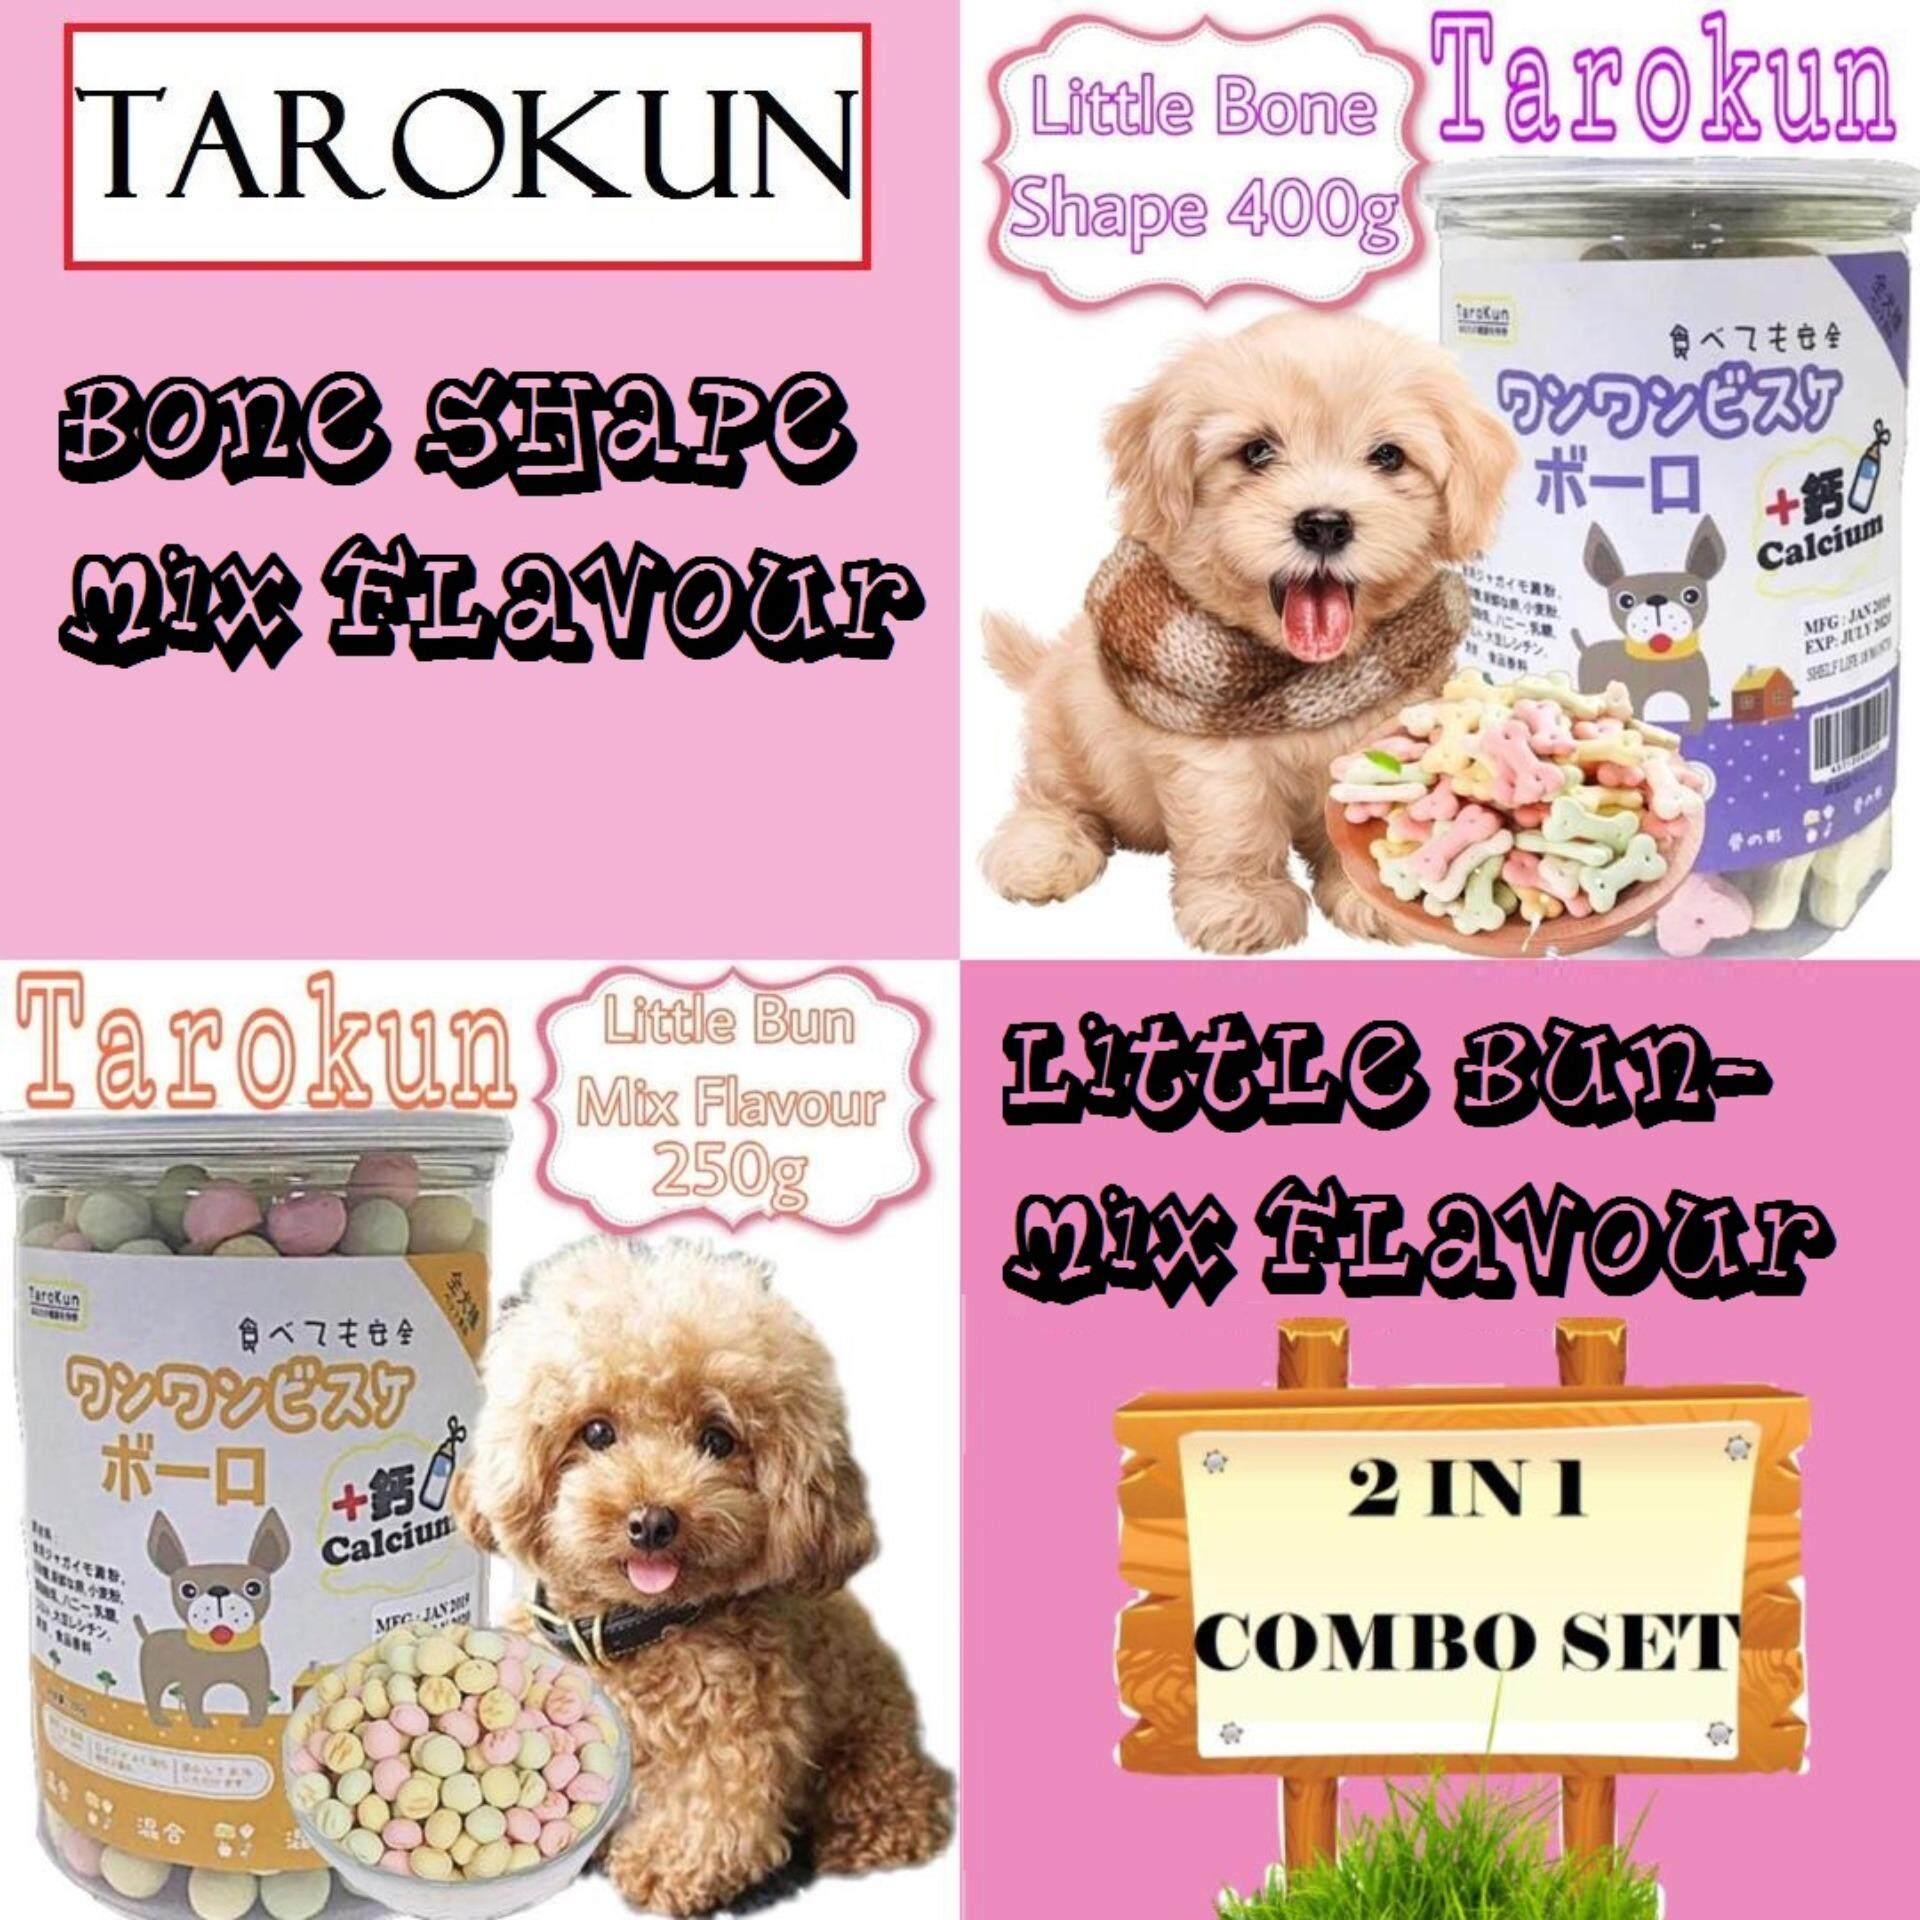 (2 in 1)TAROKUN LITTLE BUN 248G (Mix) + TAROKUN LITTLE BUN 400G